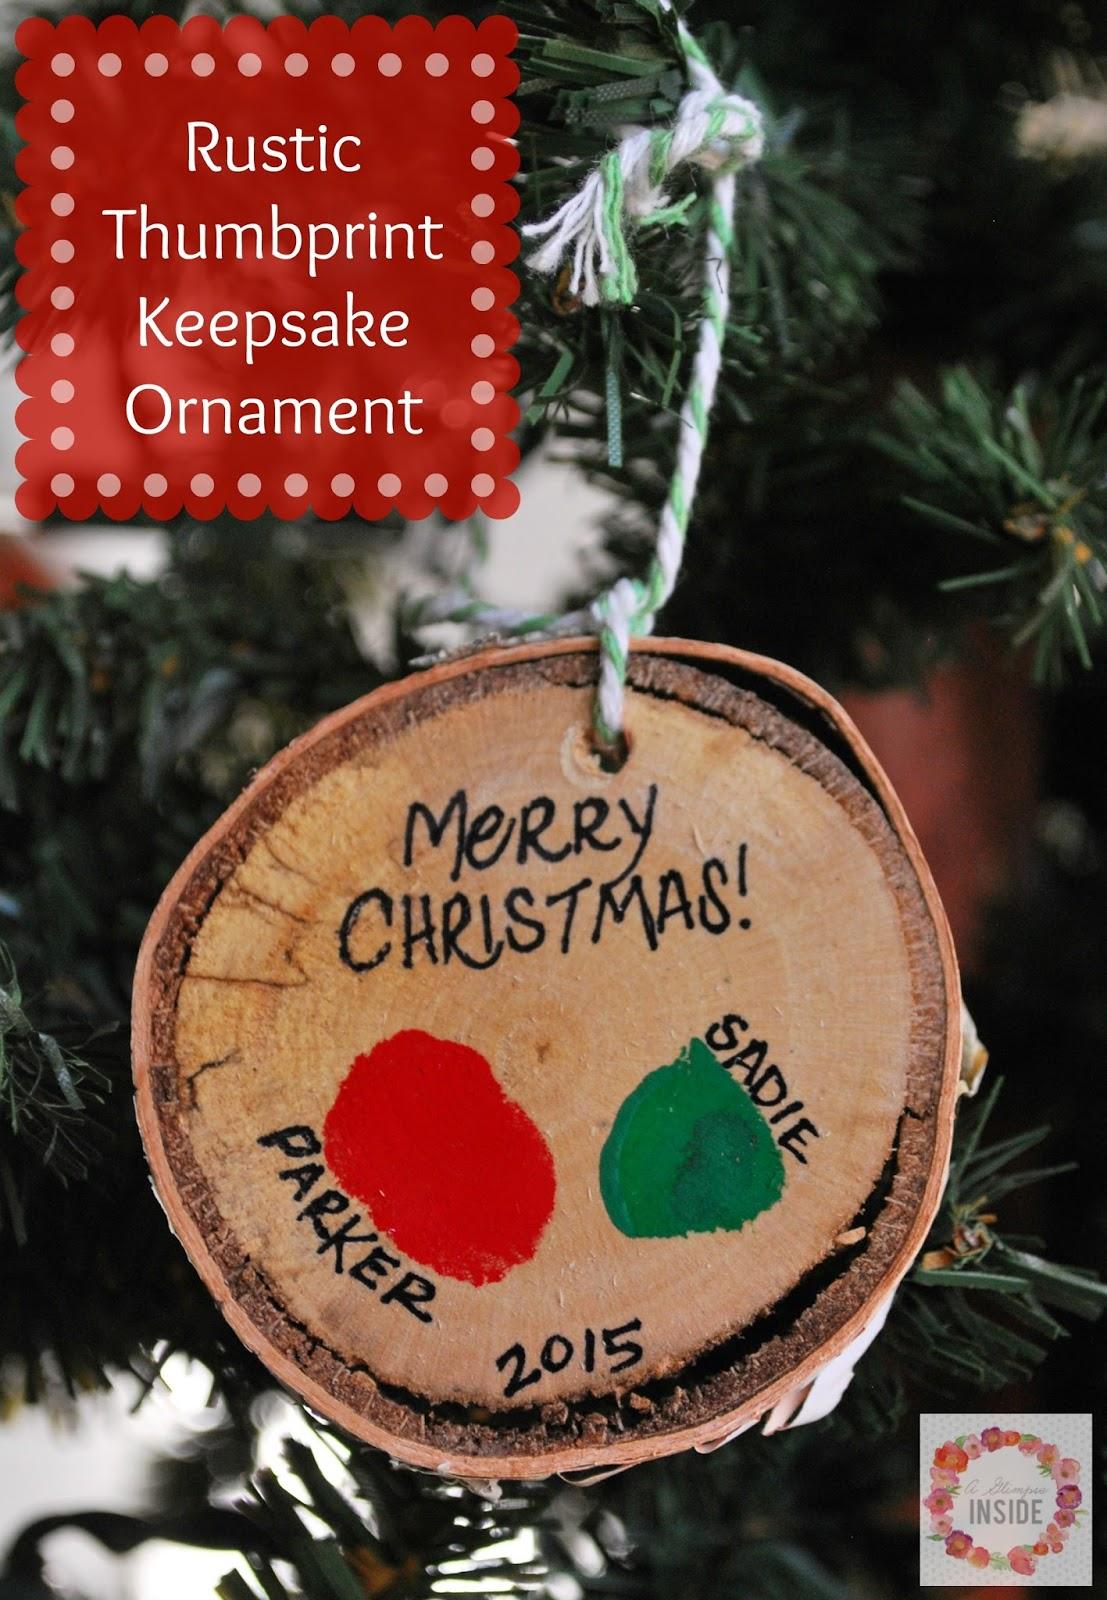 http://www.aglimpseinsideblog.com/2015/11/rustic-thumbprint-keepsake-ornament.html